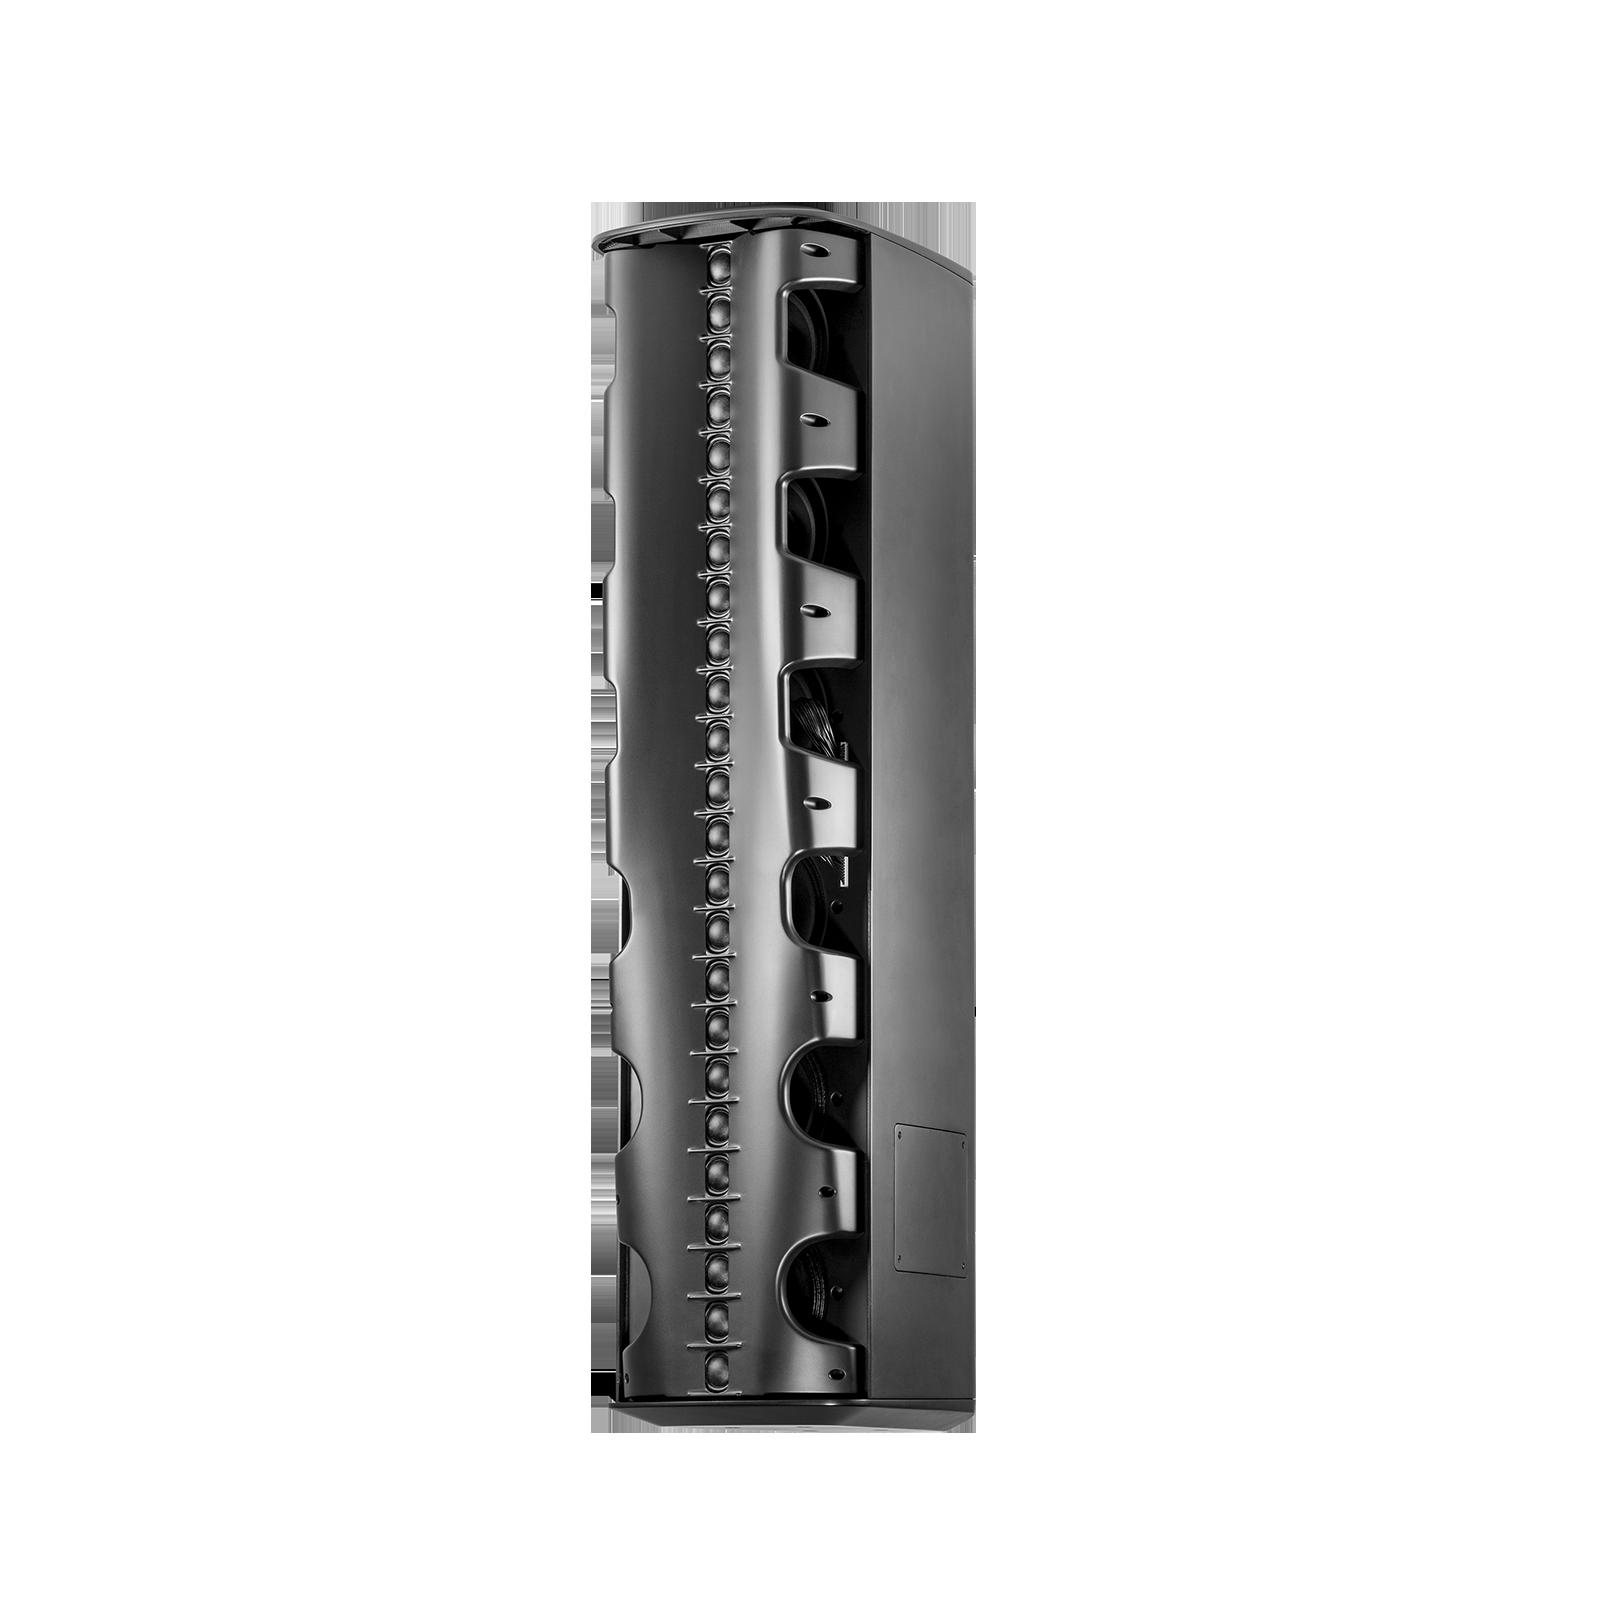 JBL CBT 1000 (B-Stock) - Black - Constant Beamwidth Technology ™ Adjustable Coverage Line Array Column - Detailshot 2